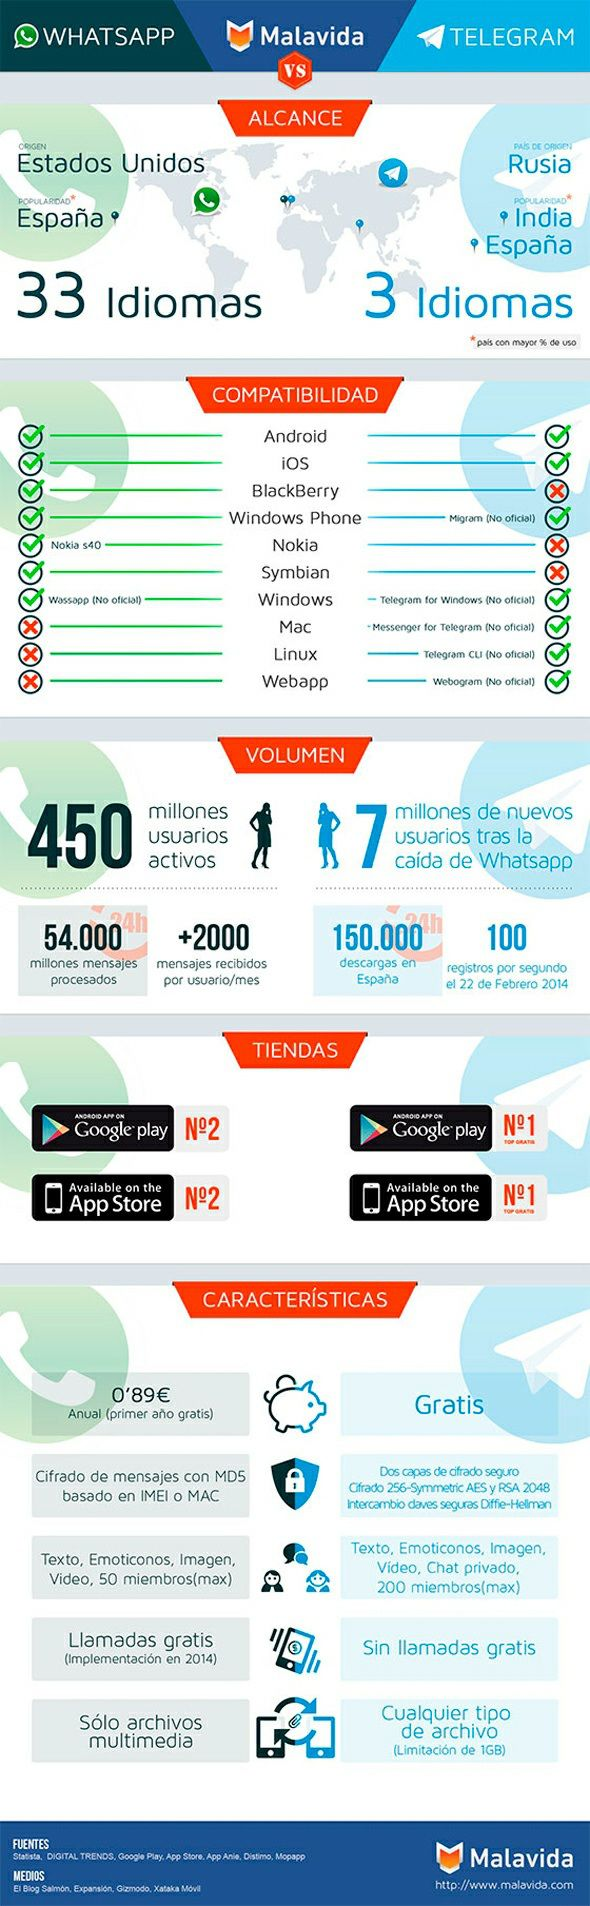 #Whatsapp vs #Telegram